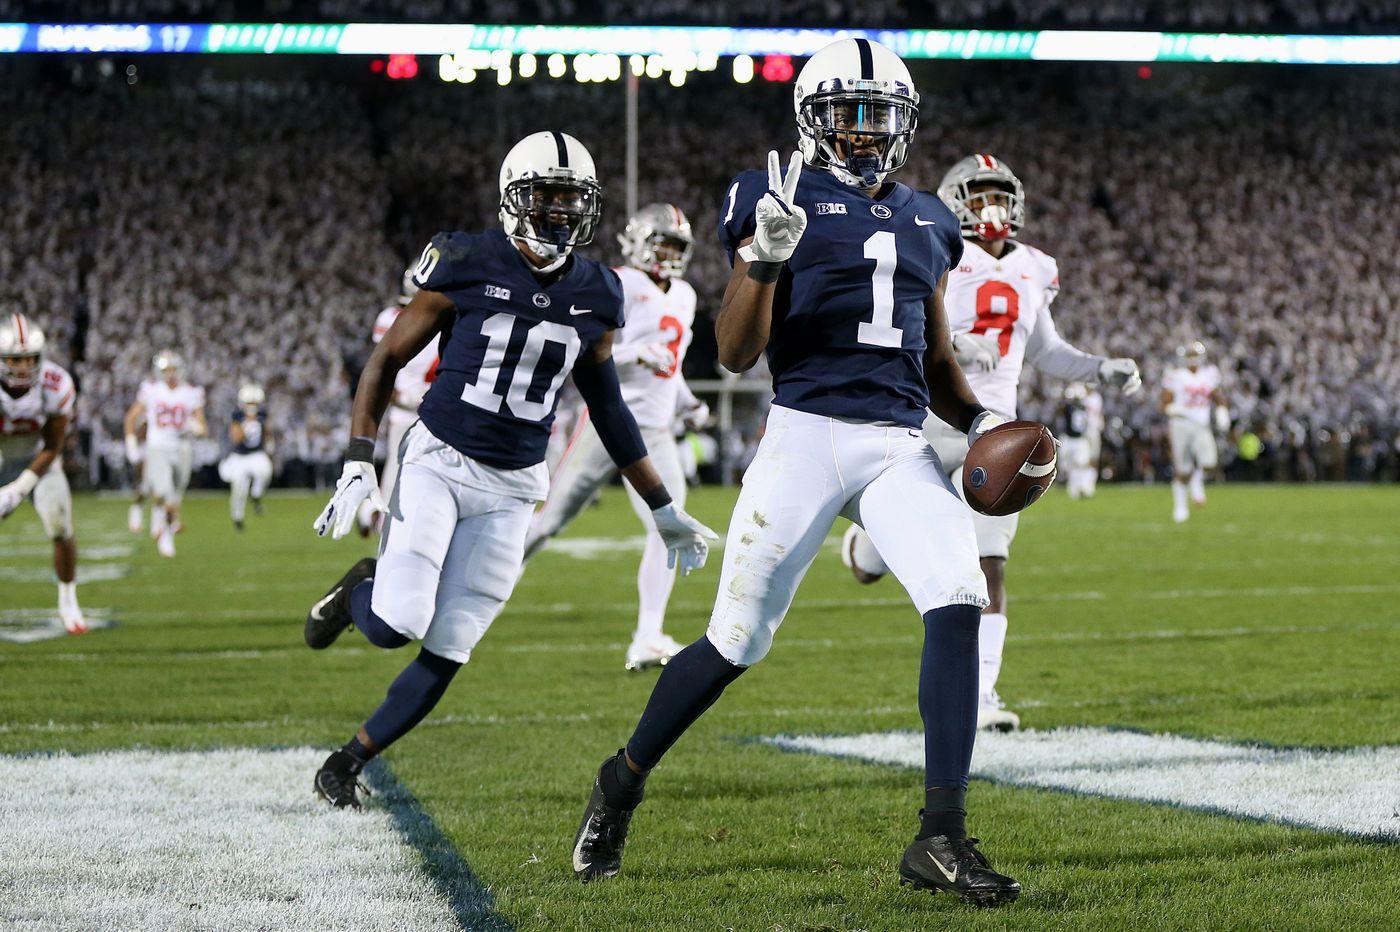 Penn State's K.J. Hamler hoping to spring more big plays vs. Kentucky in Citrus Bowl